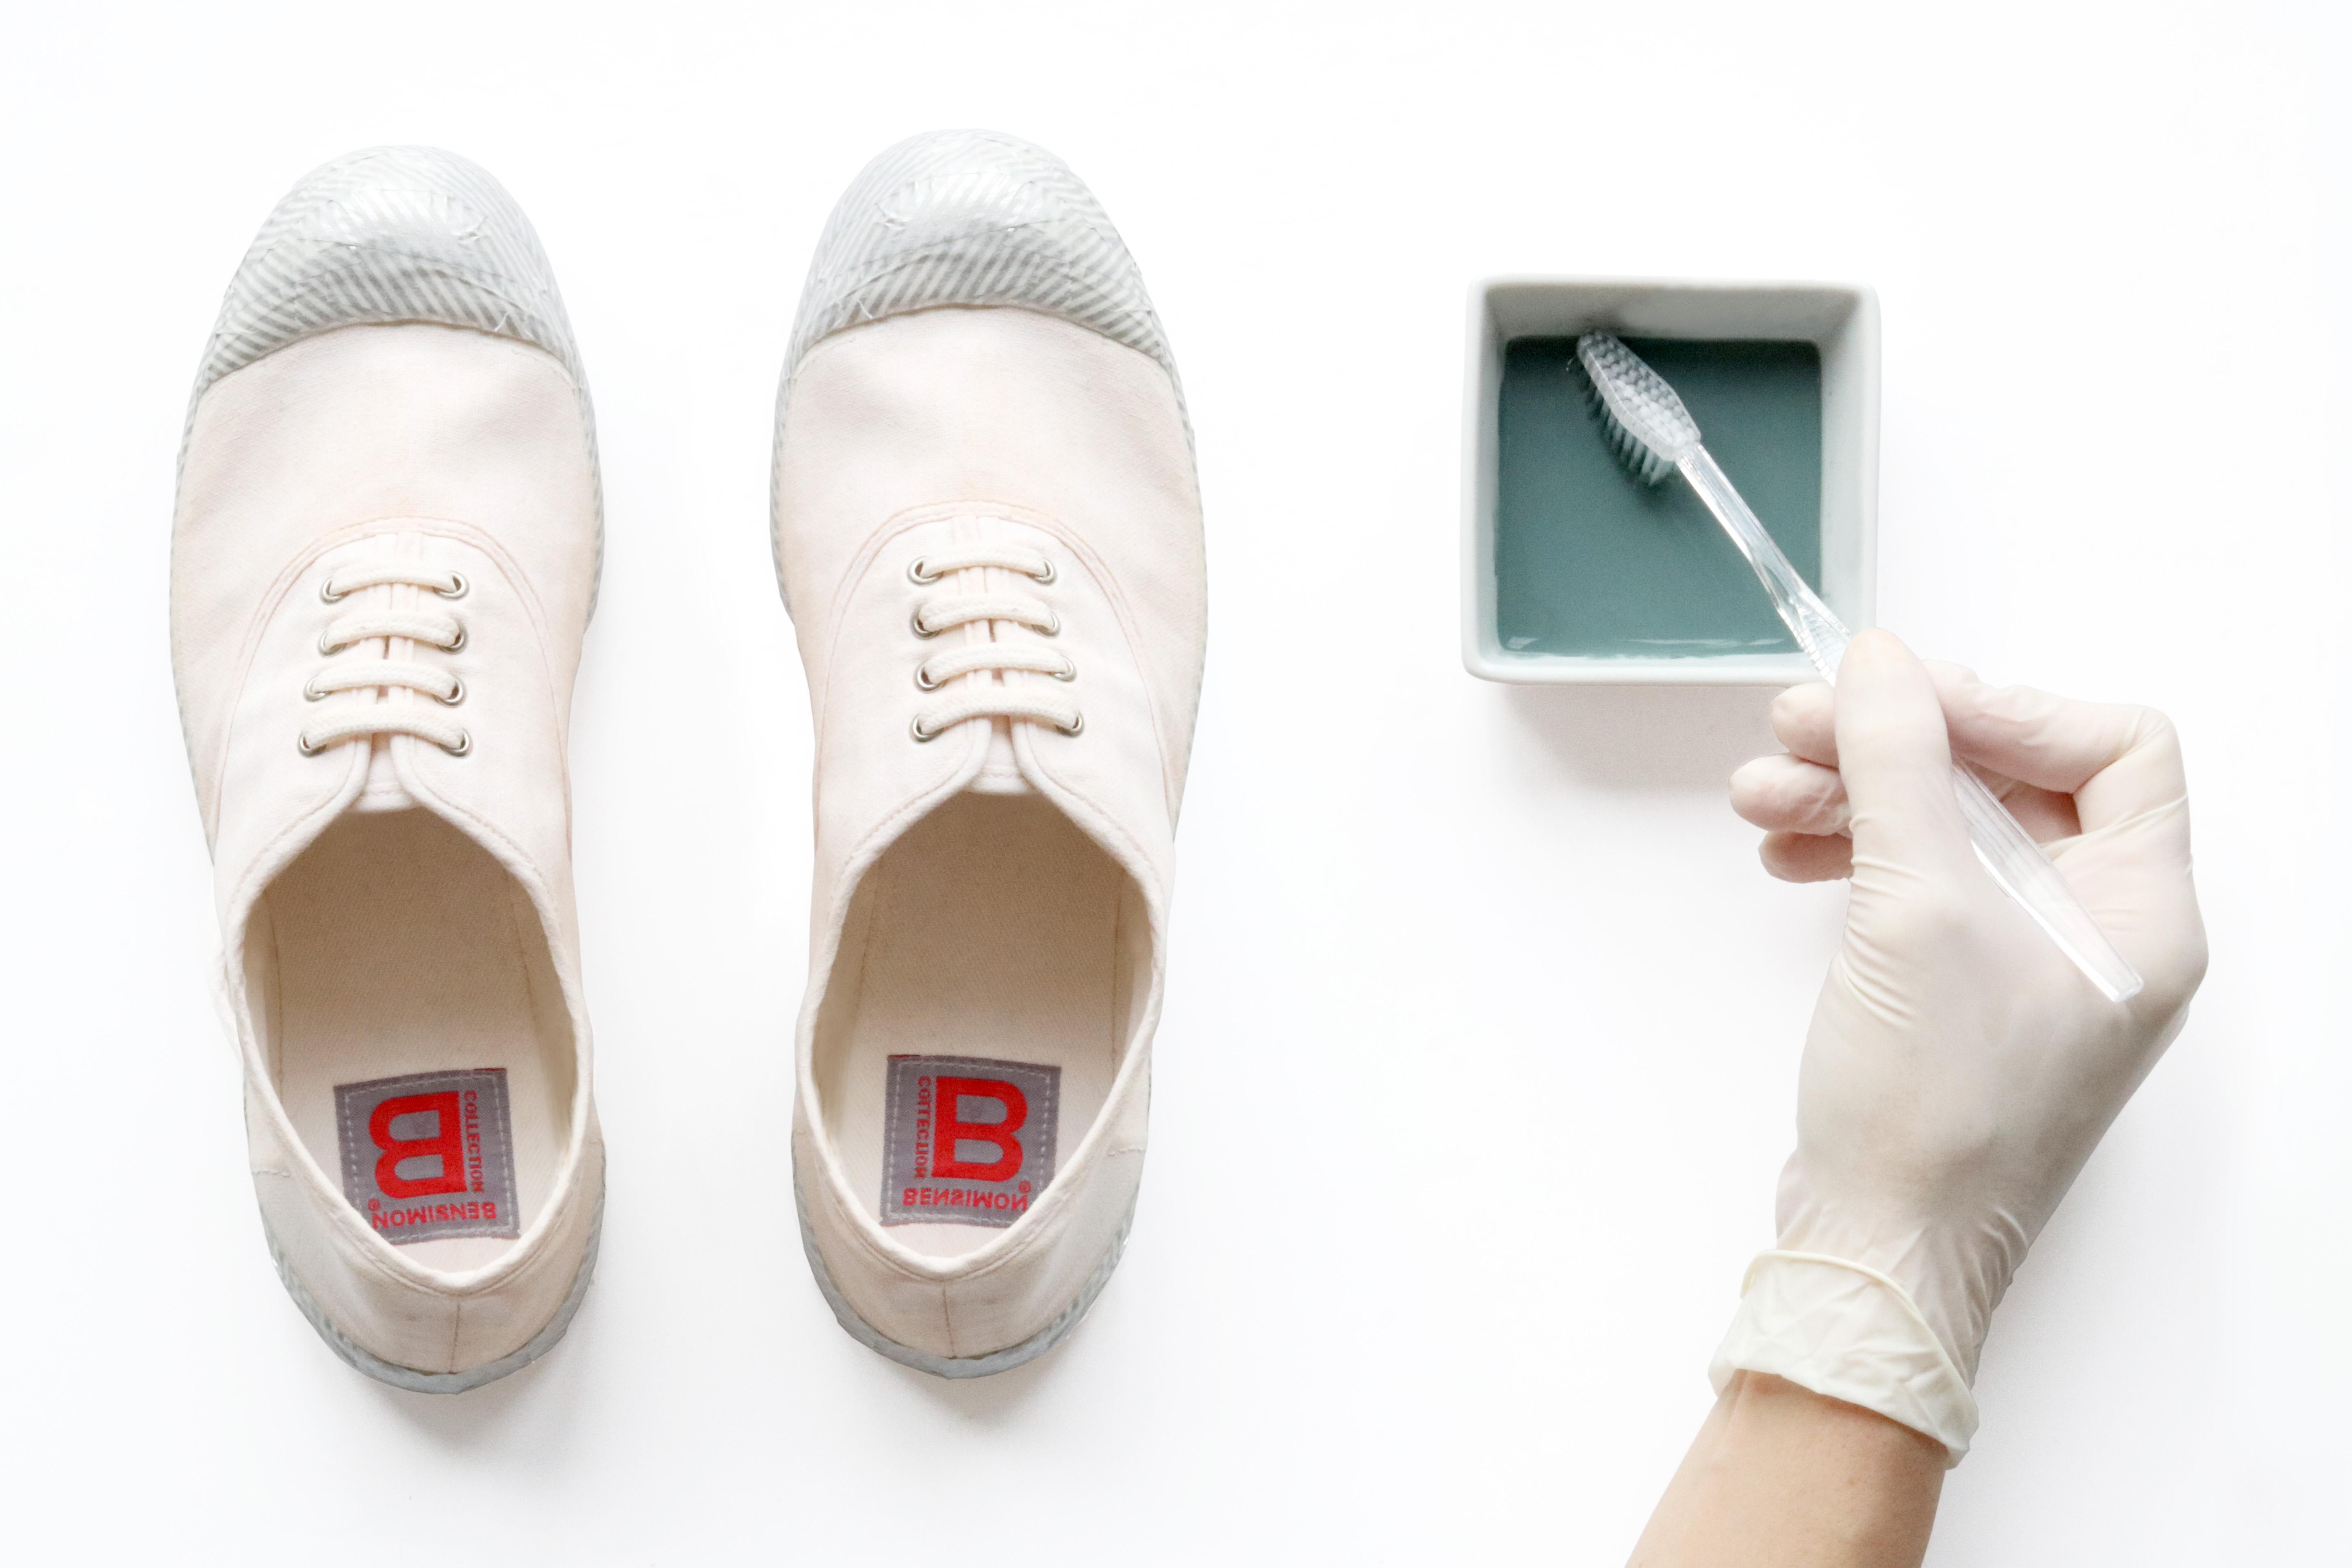 DIY-chaussures-creatives